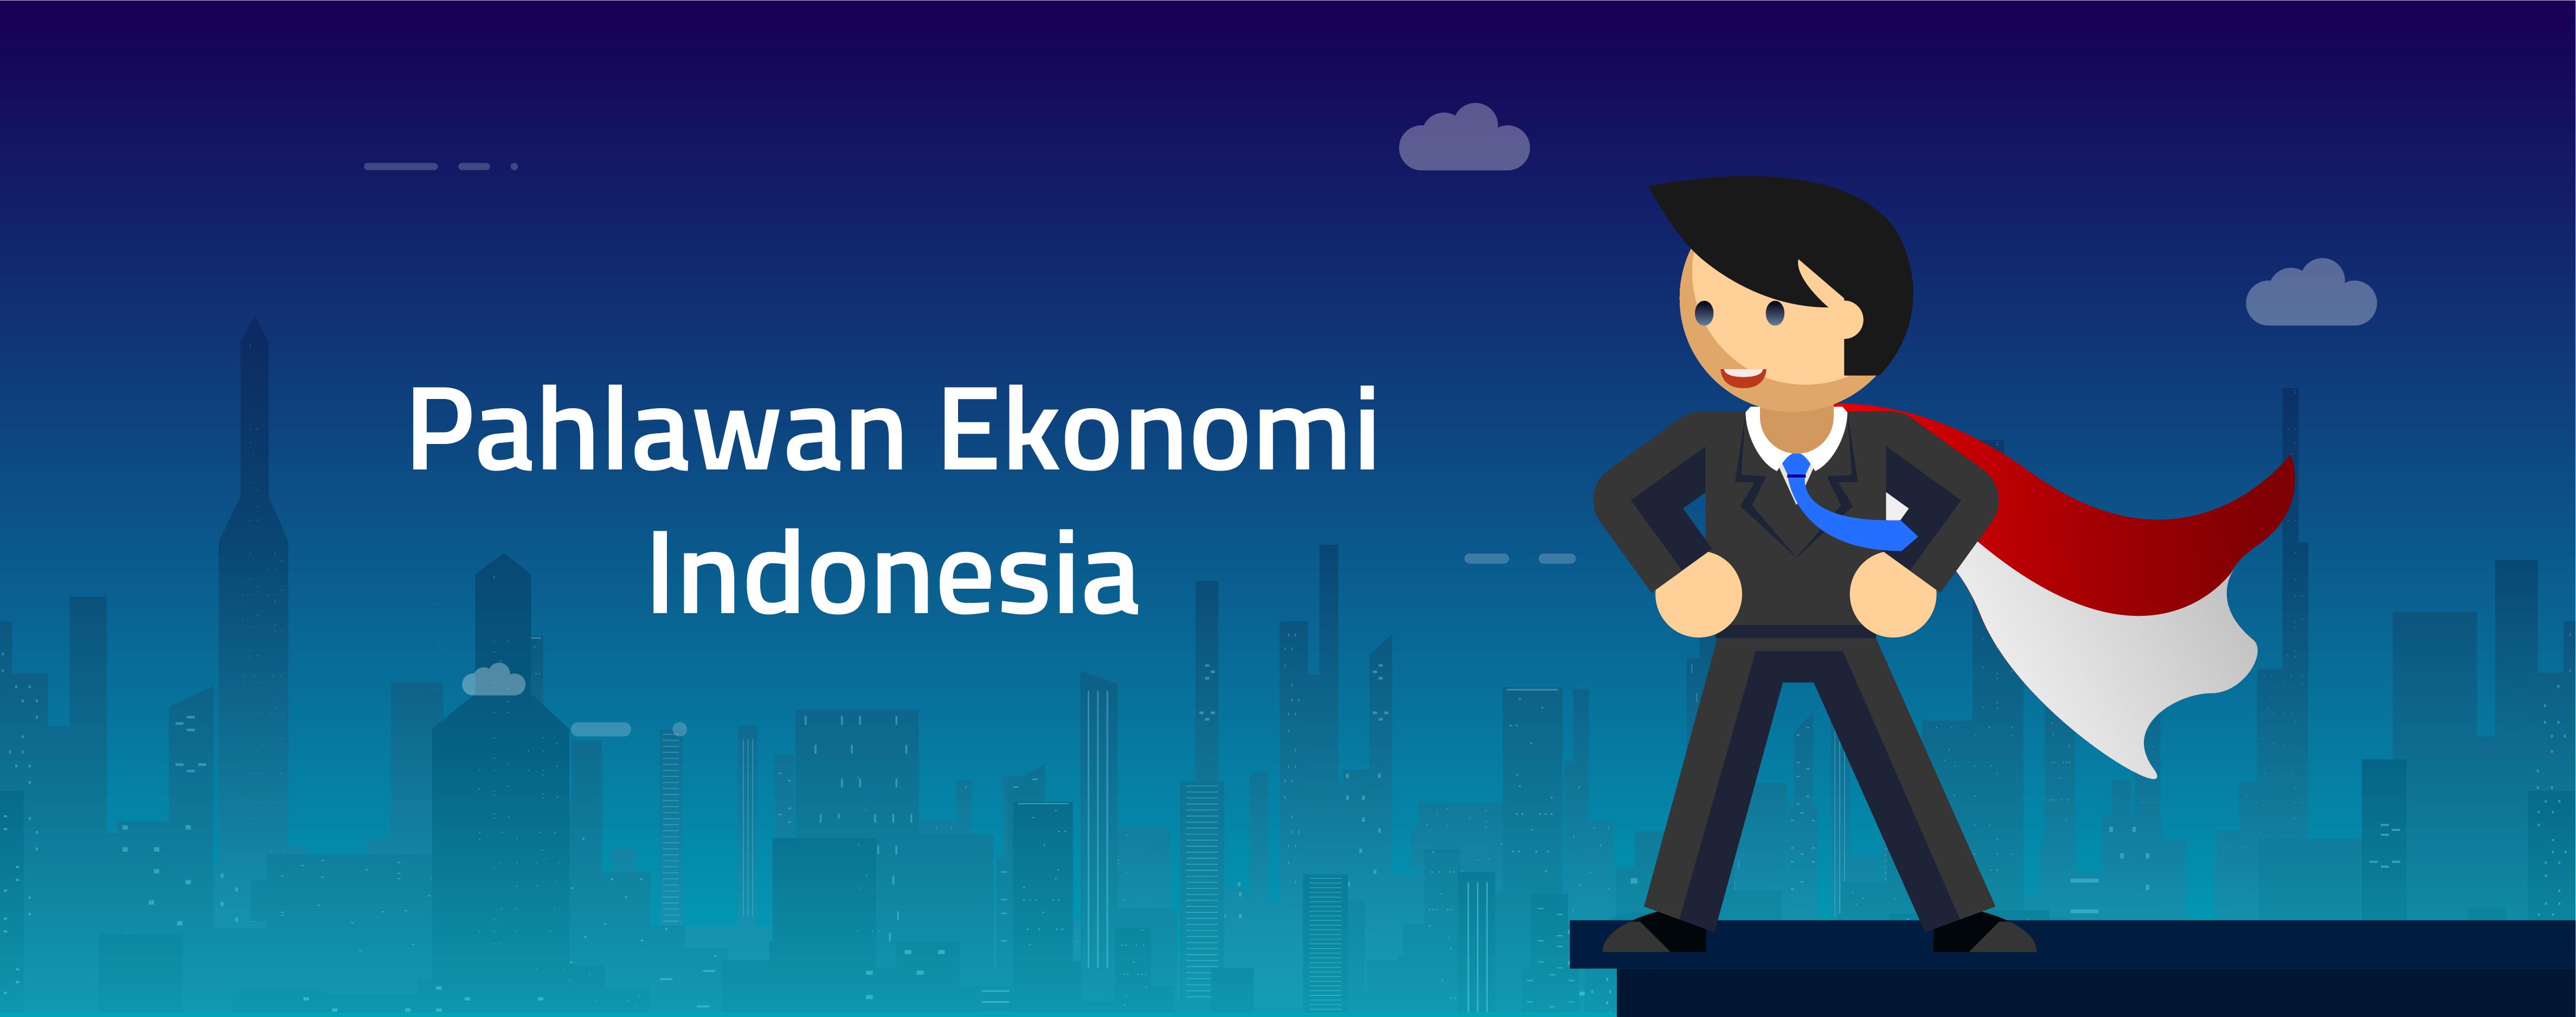 PAHLAWAN EKONOMI INDONESIA